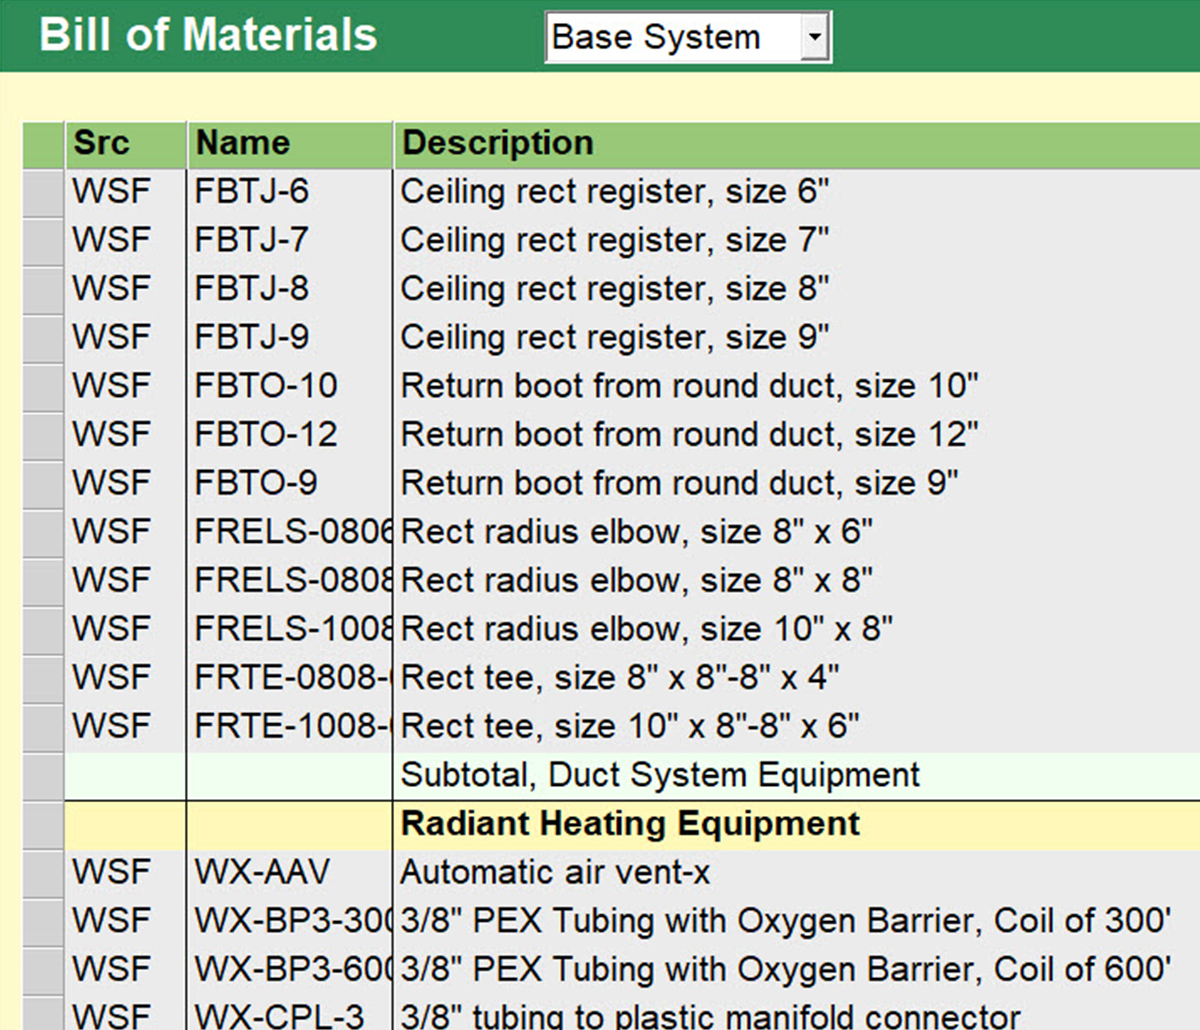 MiTek Wrightsoft Business Solutions Estimating Software - Screenshot of Wrightsoft software